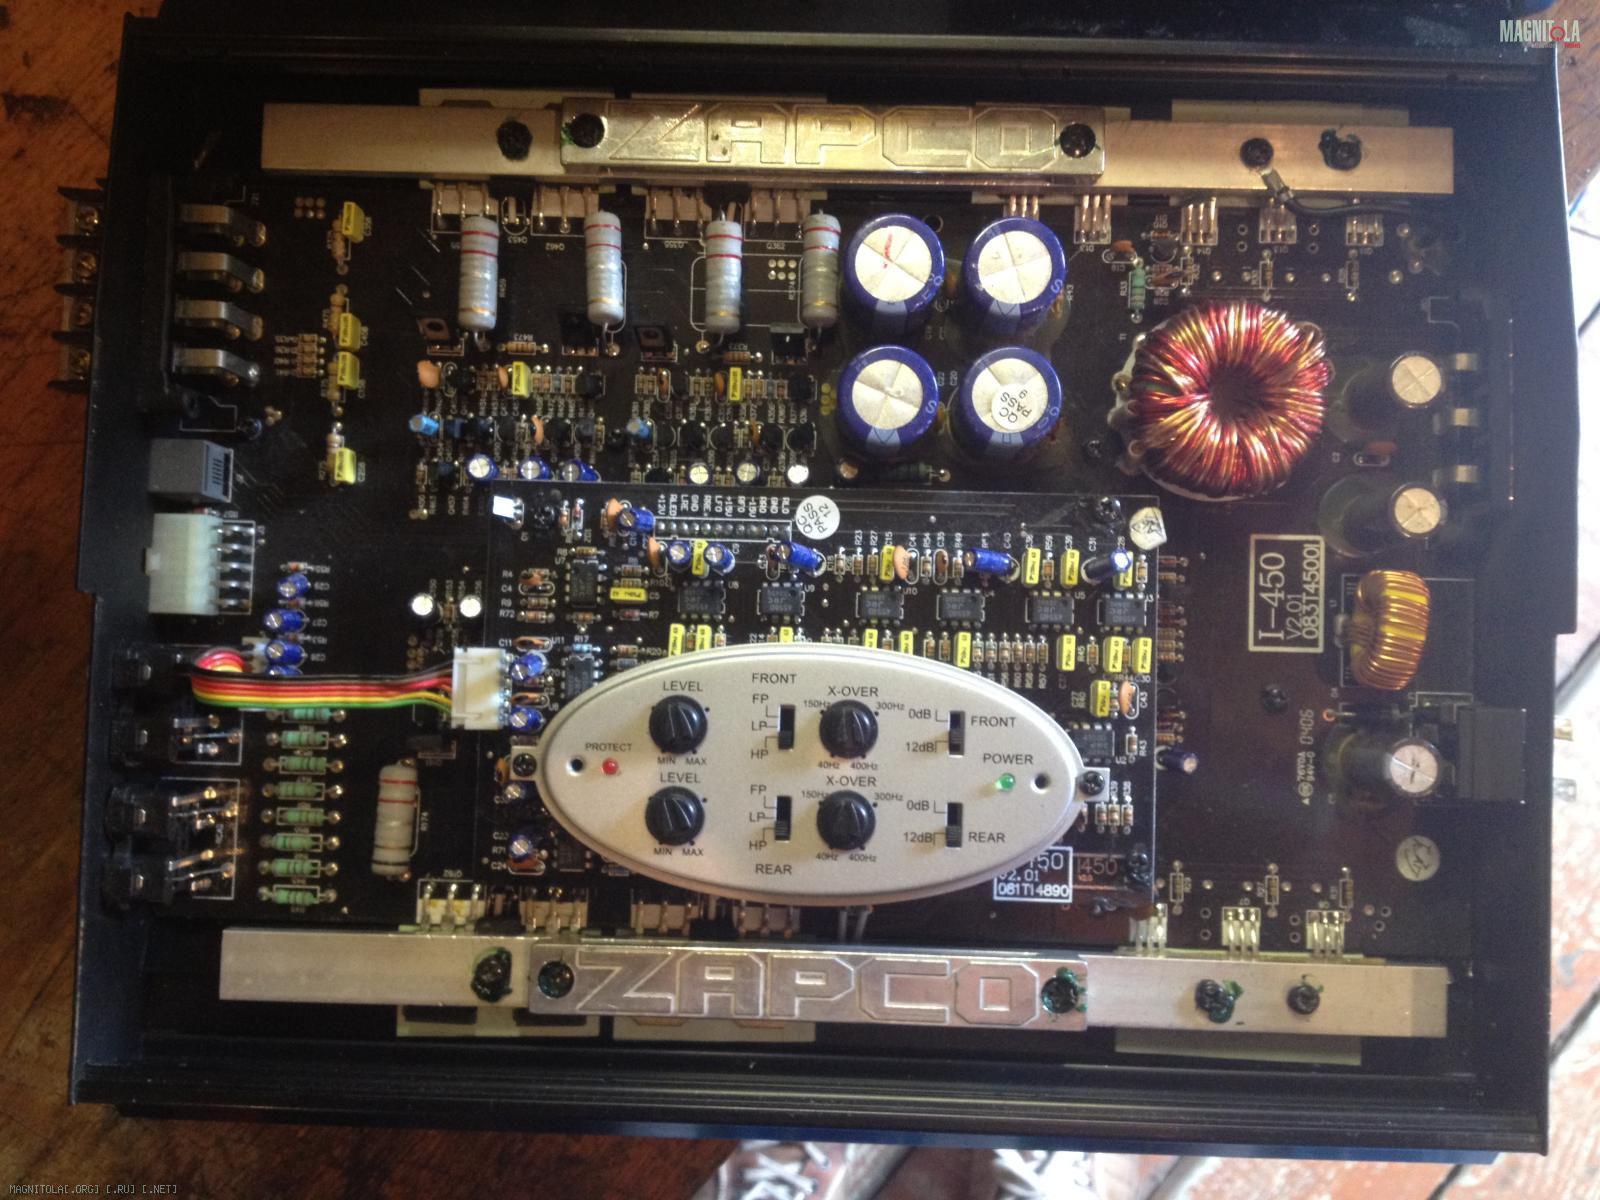 Zapco i4504 4 channel car audio stereo amplifier crossover and remote